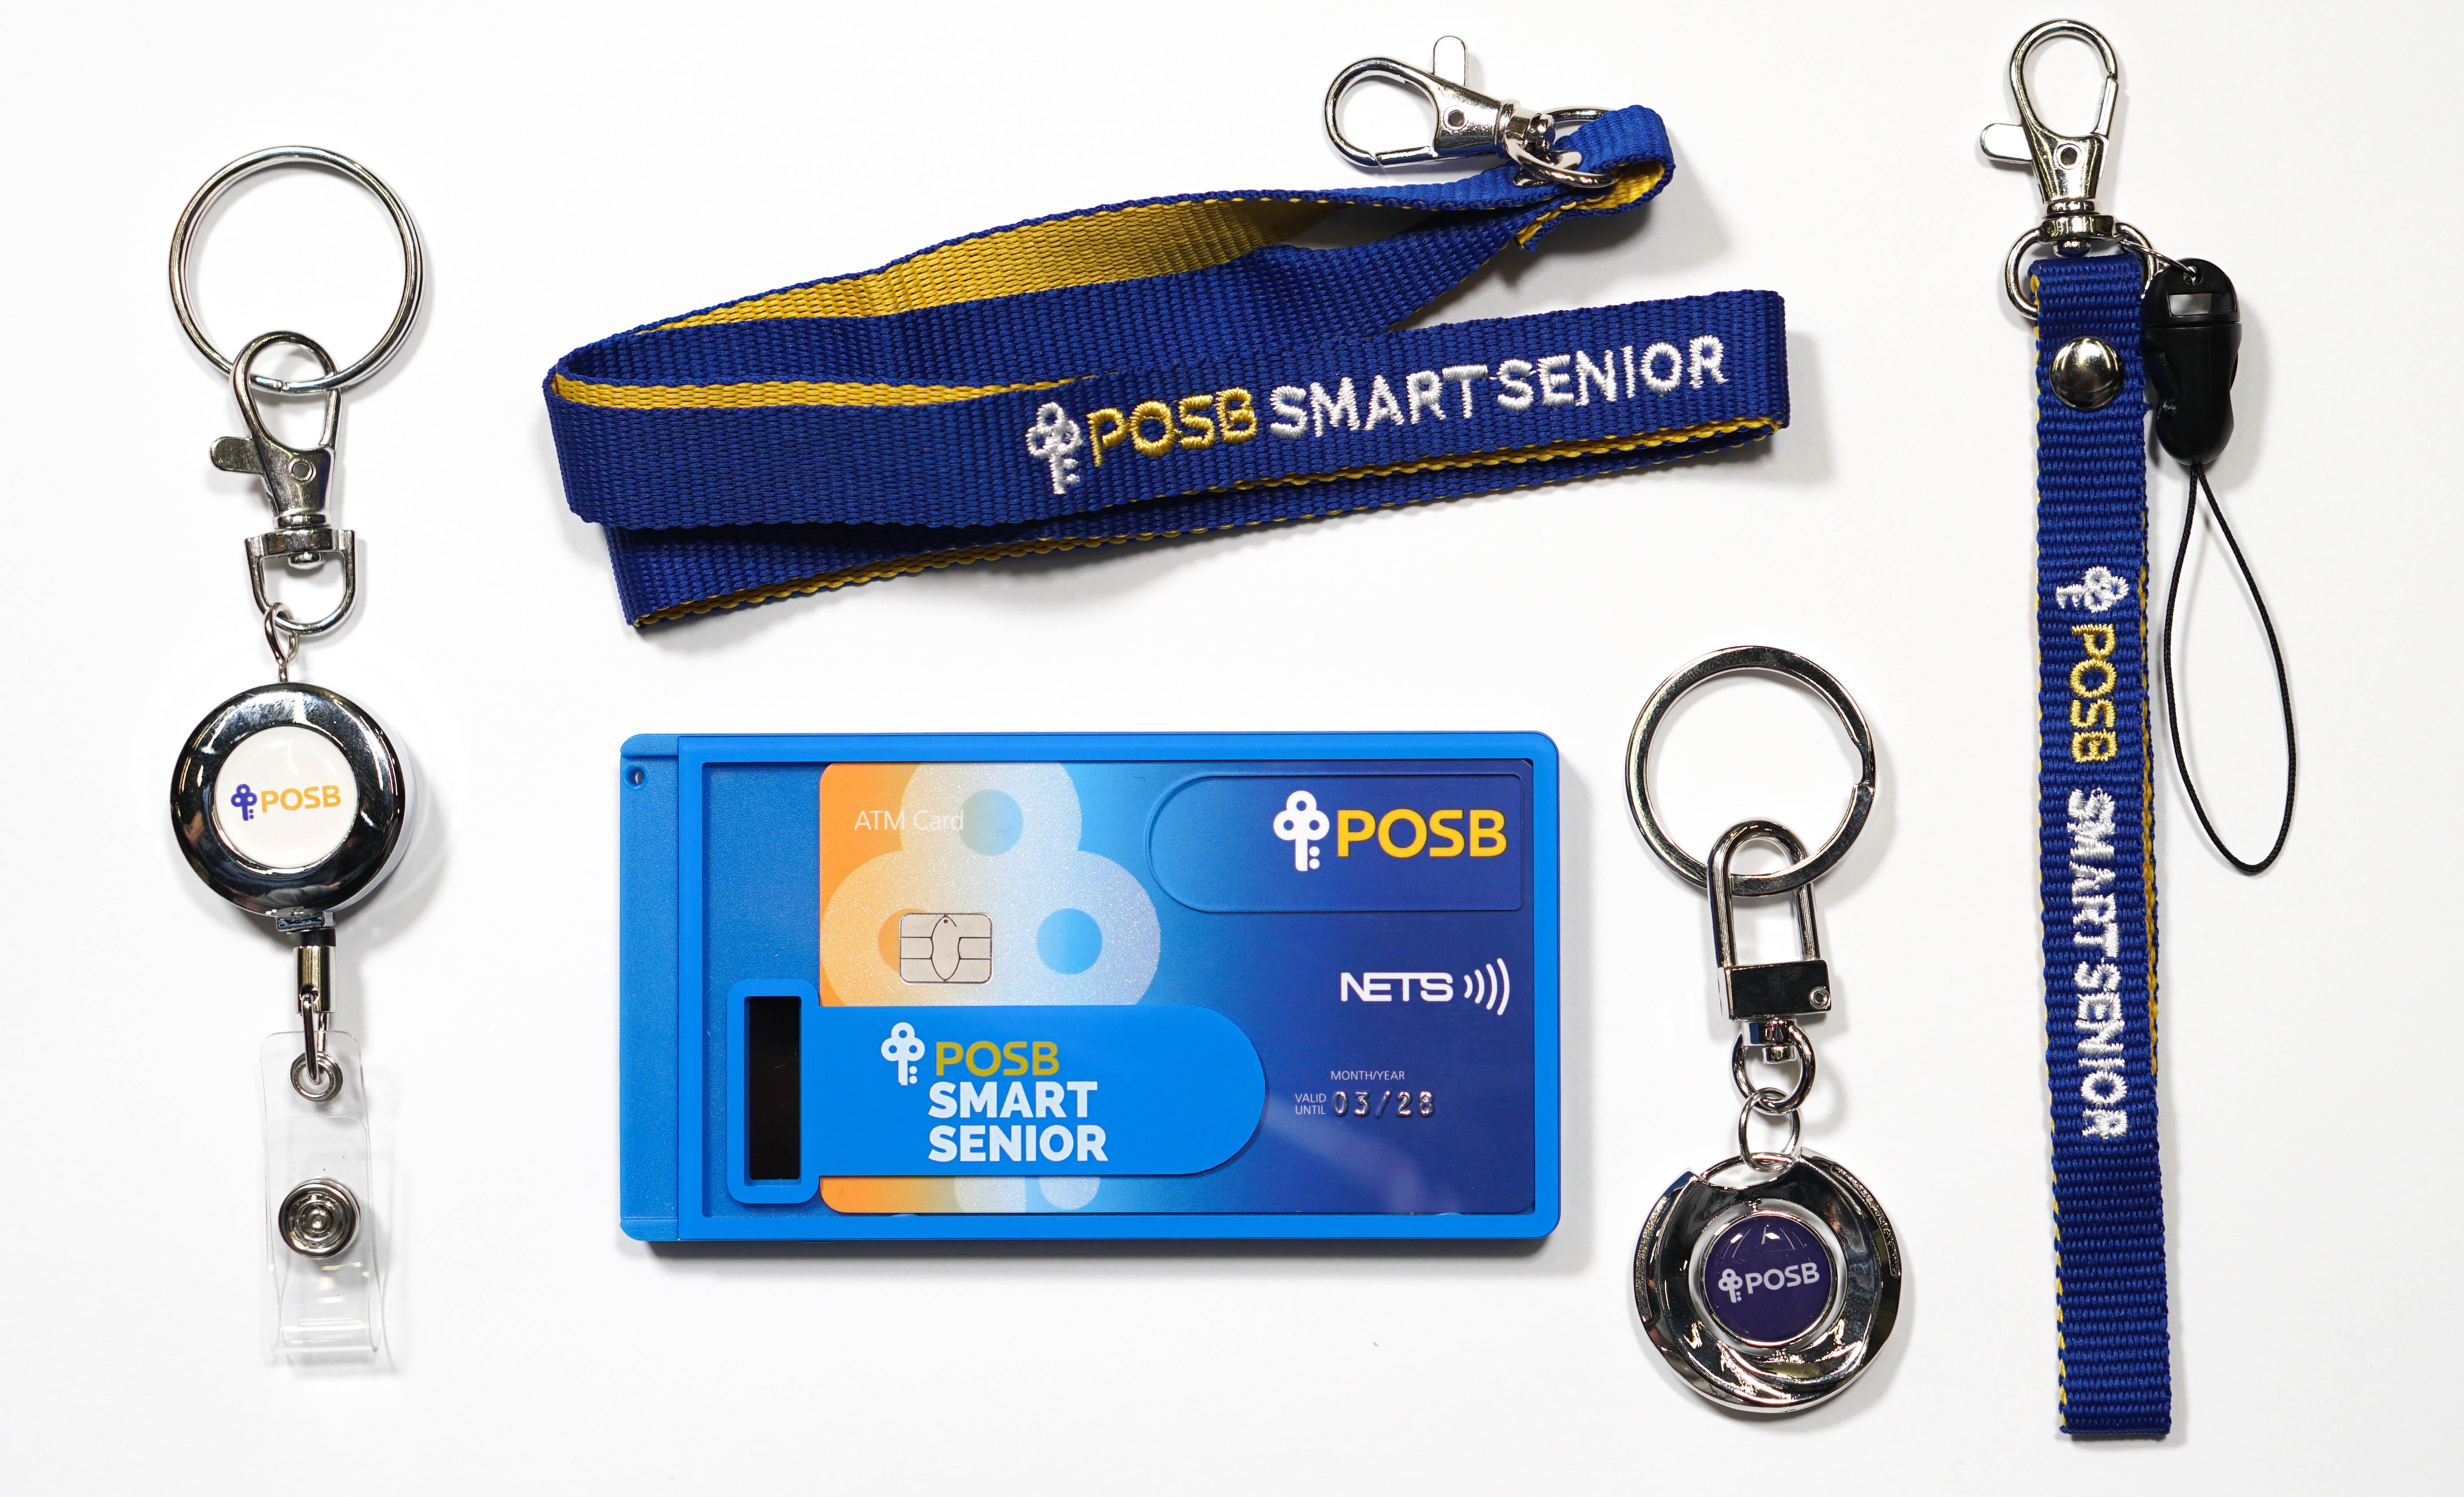 POSB Smart Senior